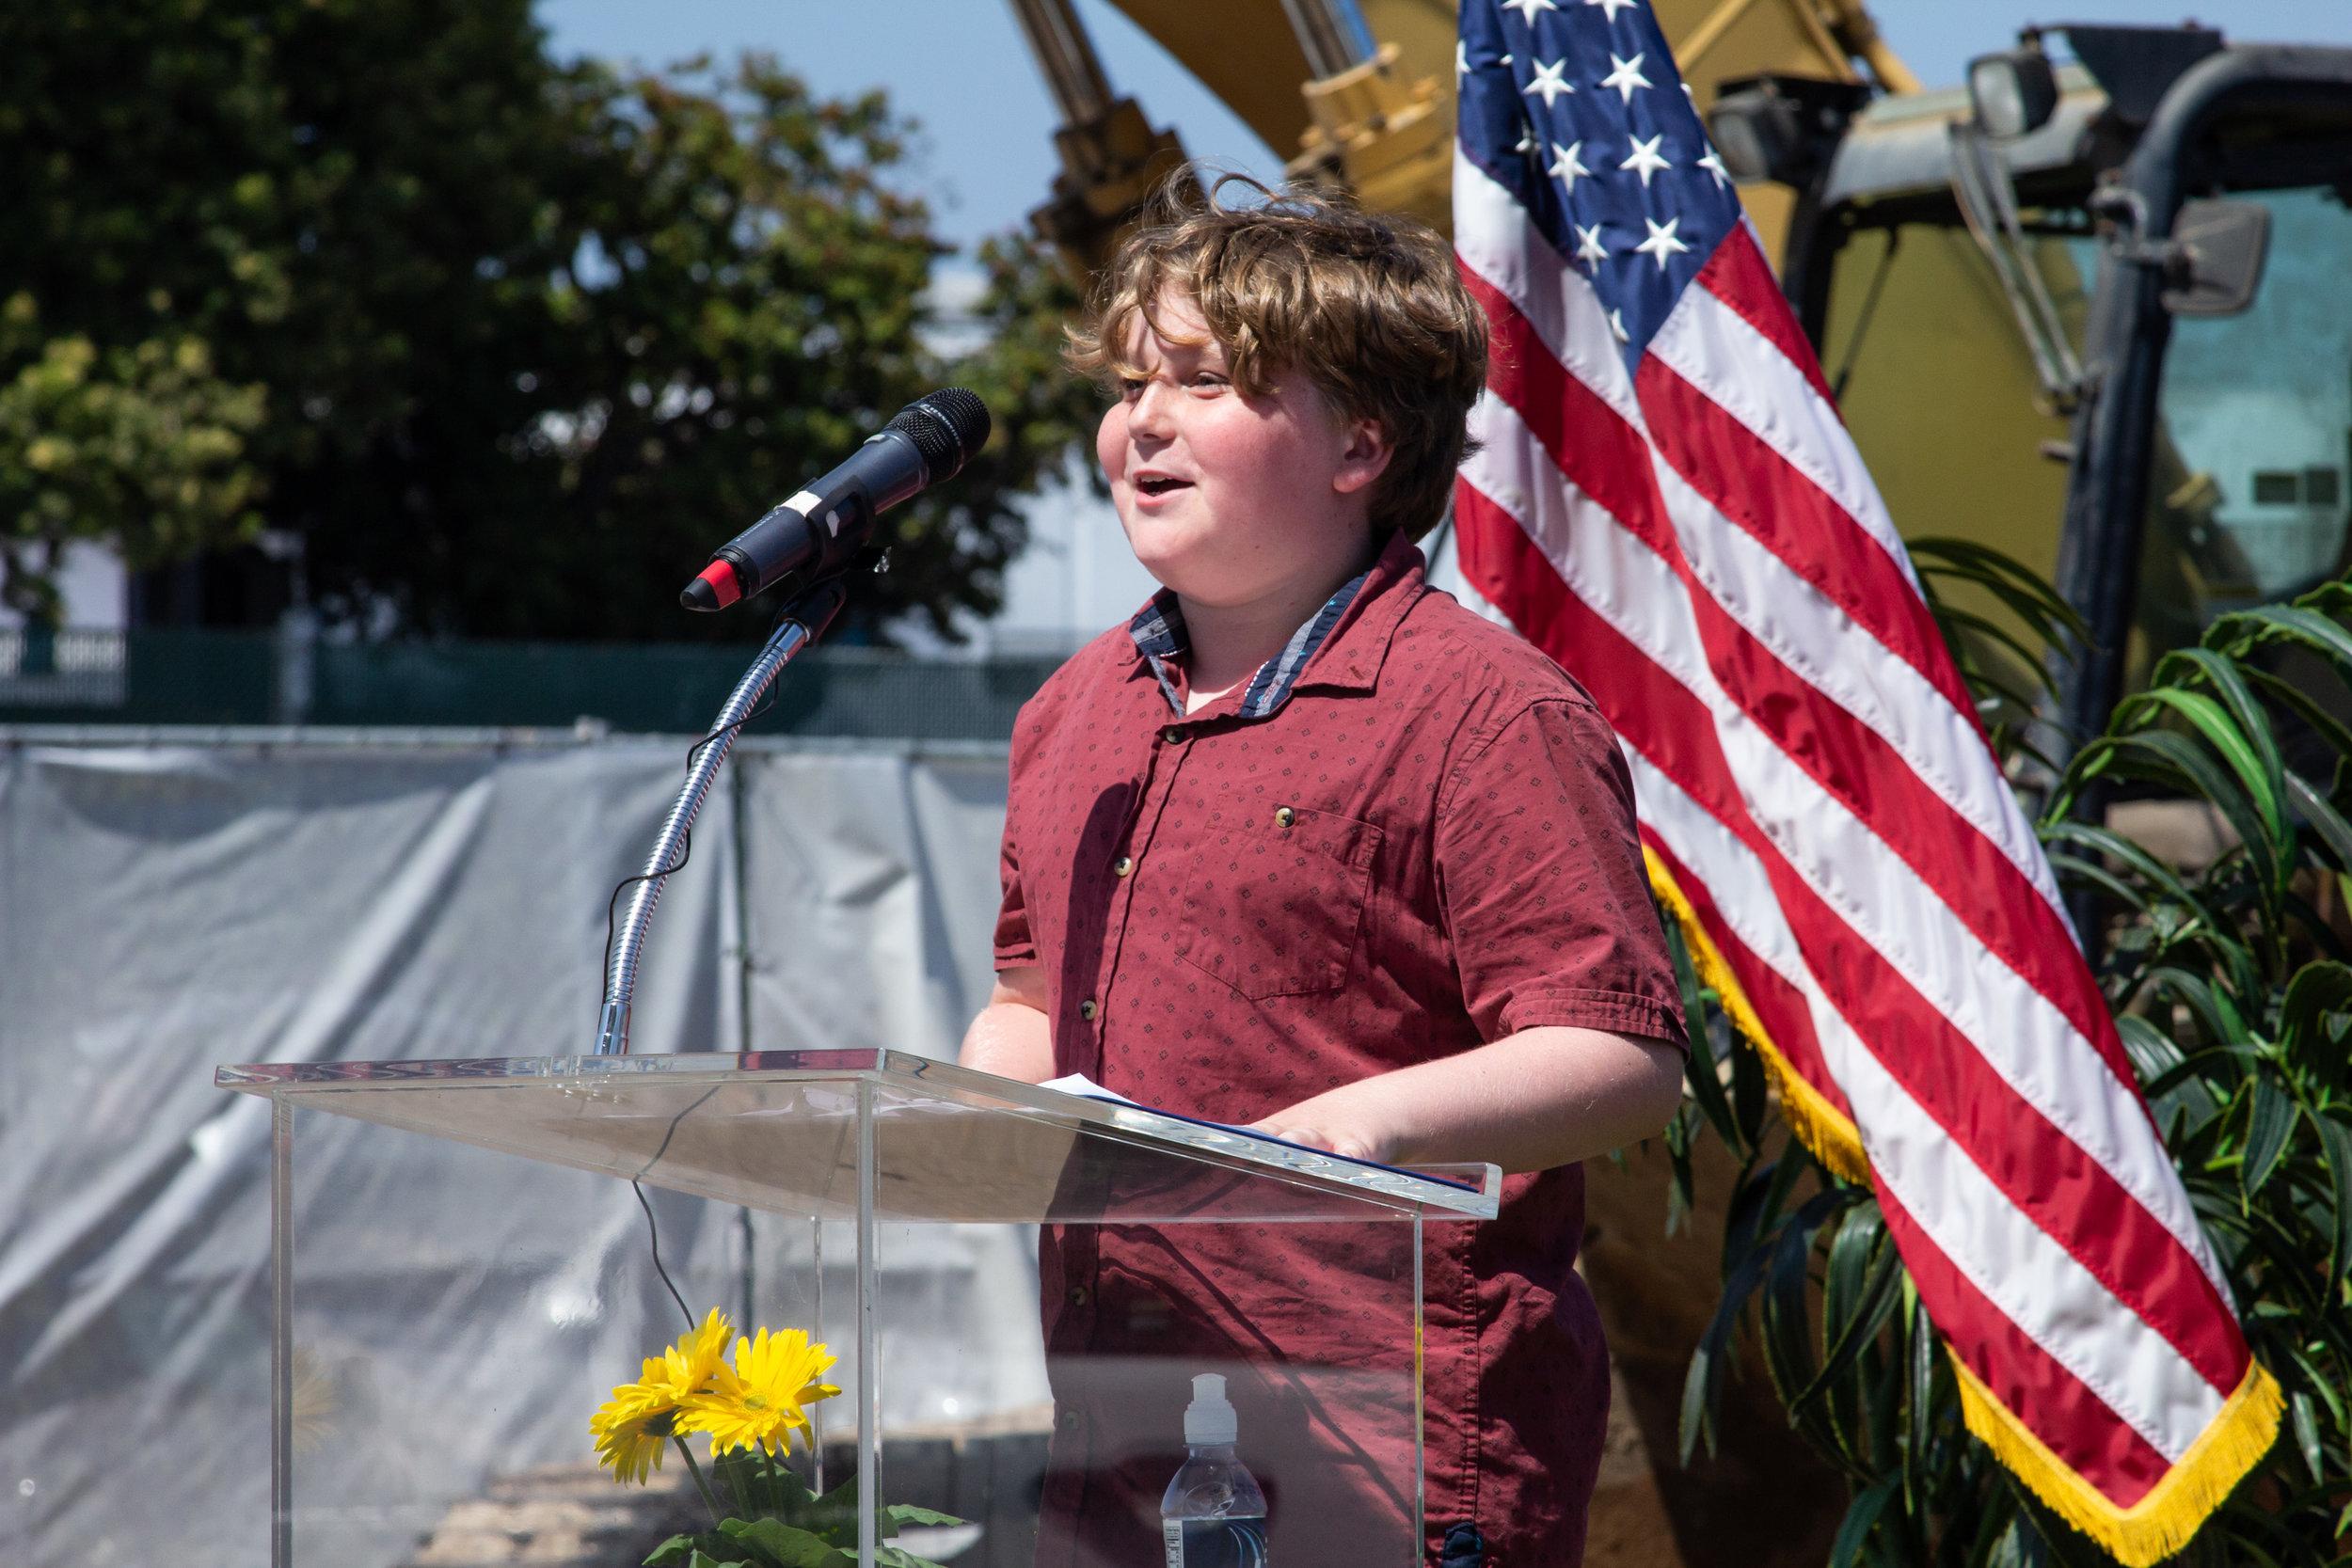 John Adams Middle School student Waldon Sullivan speaks at the groundbreaking ceremony for the John Adams Middle School Performing Arts Complex in Santa Monica, California, on Wednesday, August 28th. 2019. (Marco Pallotti/ The Corsair)